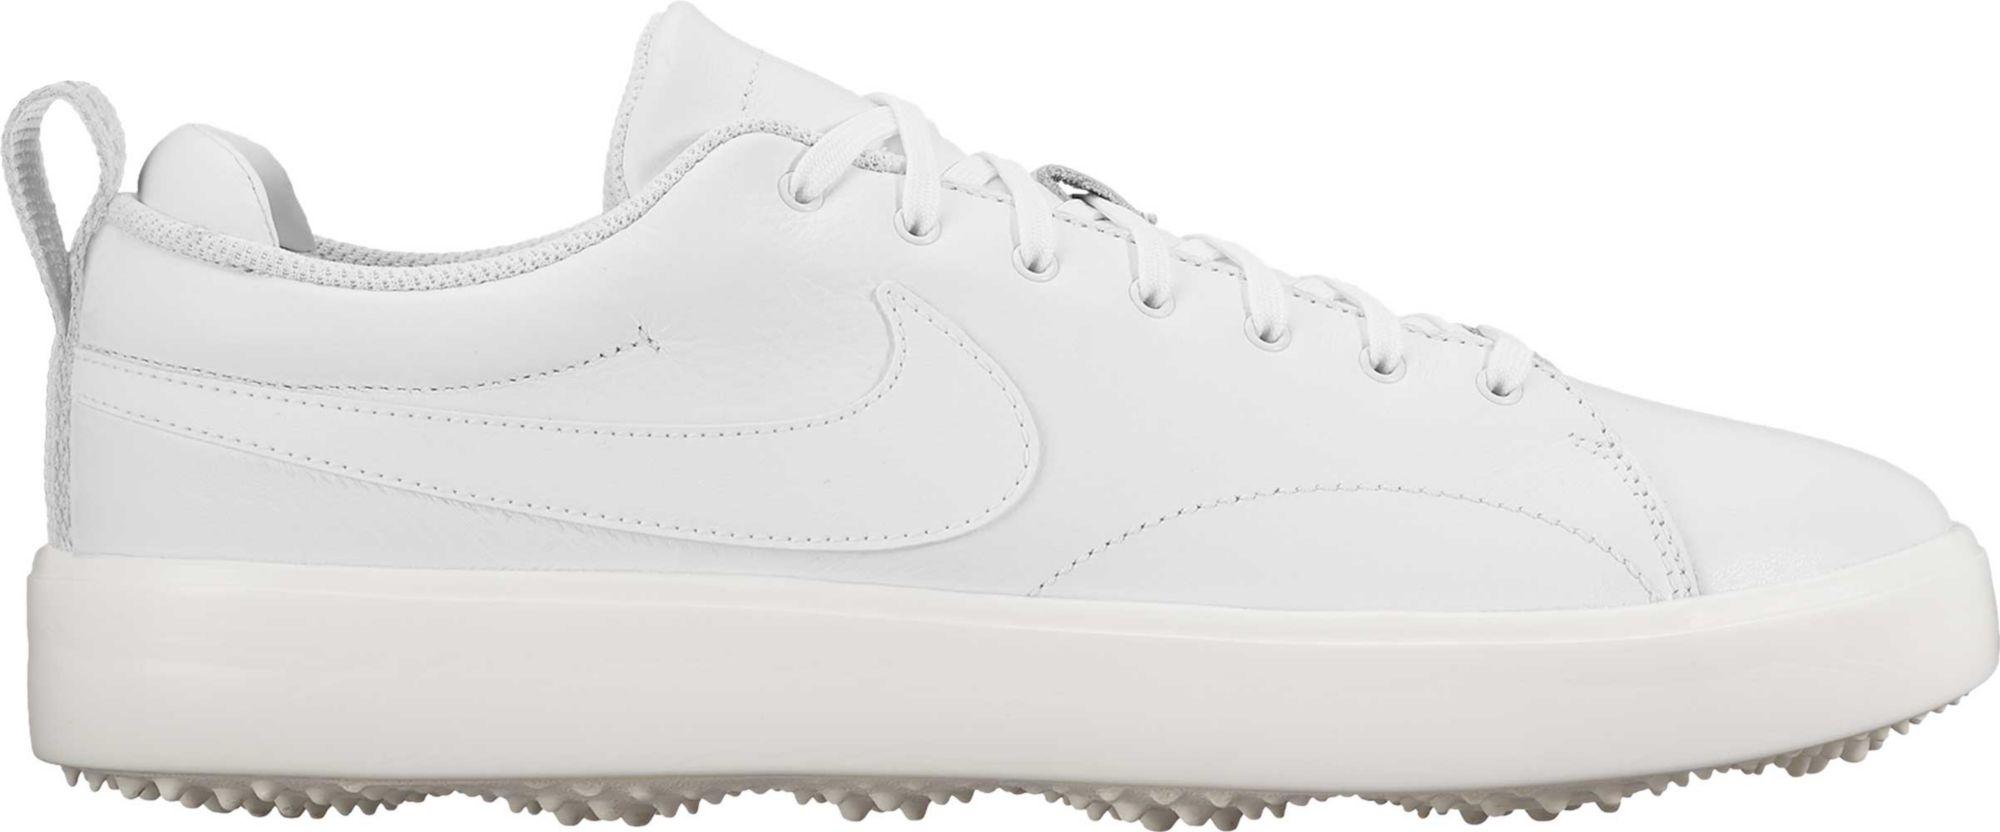 Product Image �� Nike Men\u0027s Course Classic Golf Shoes